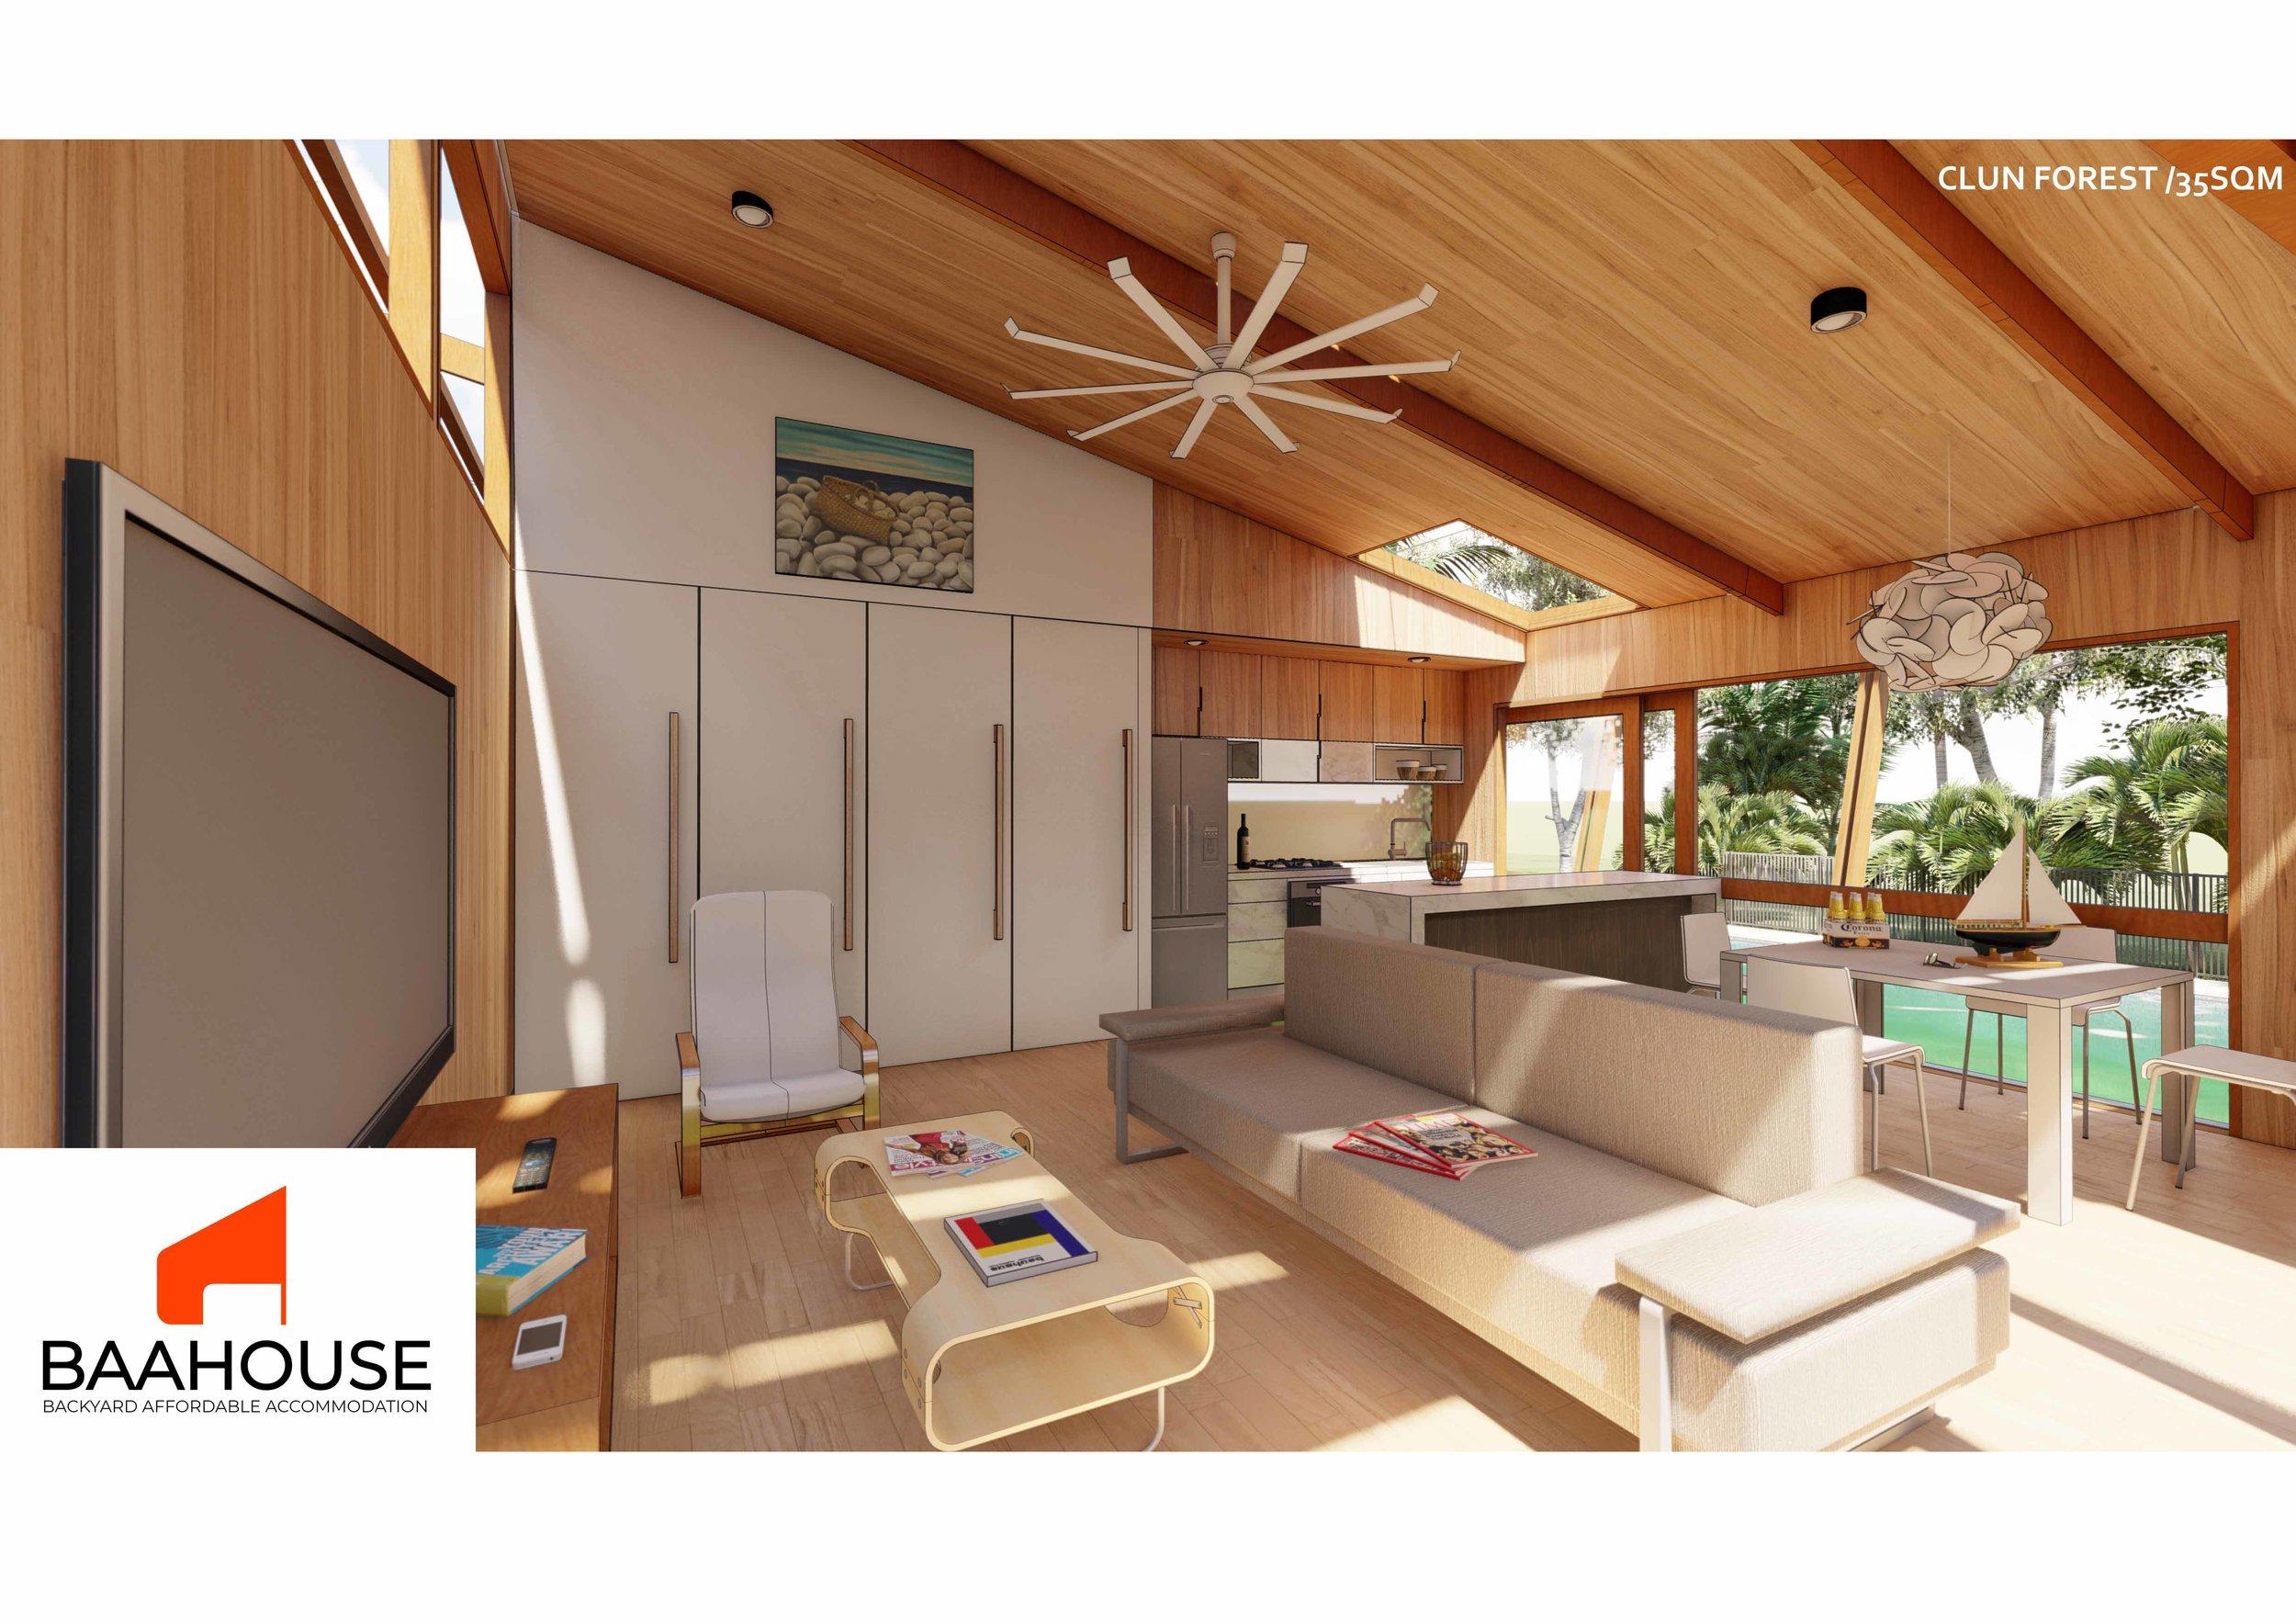 Clun Forest interior 2019 web.jpg